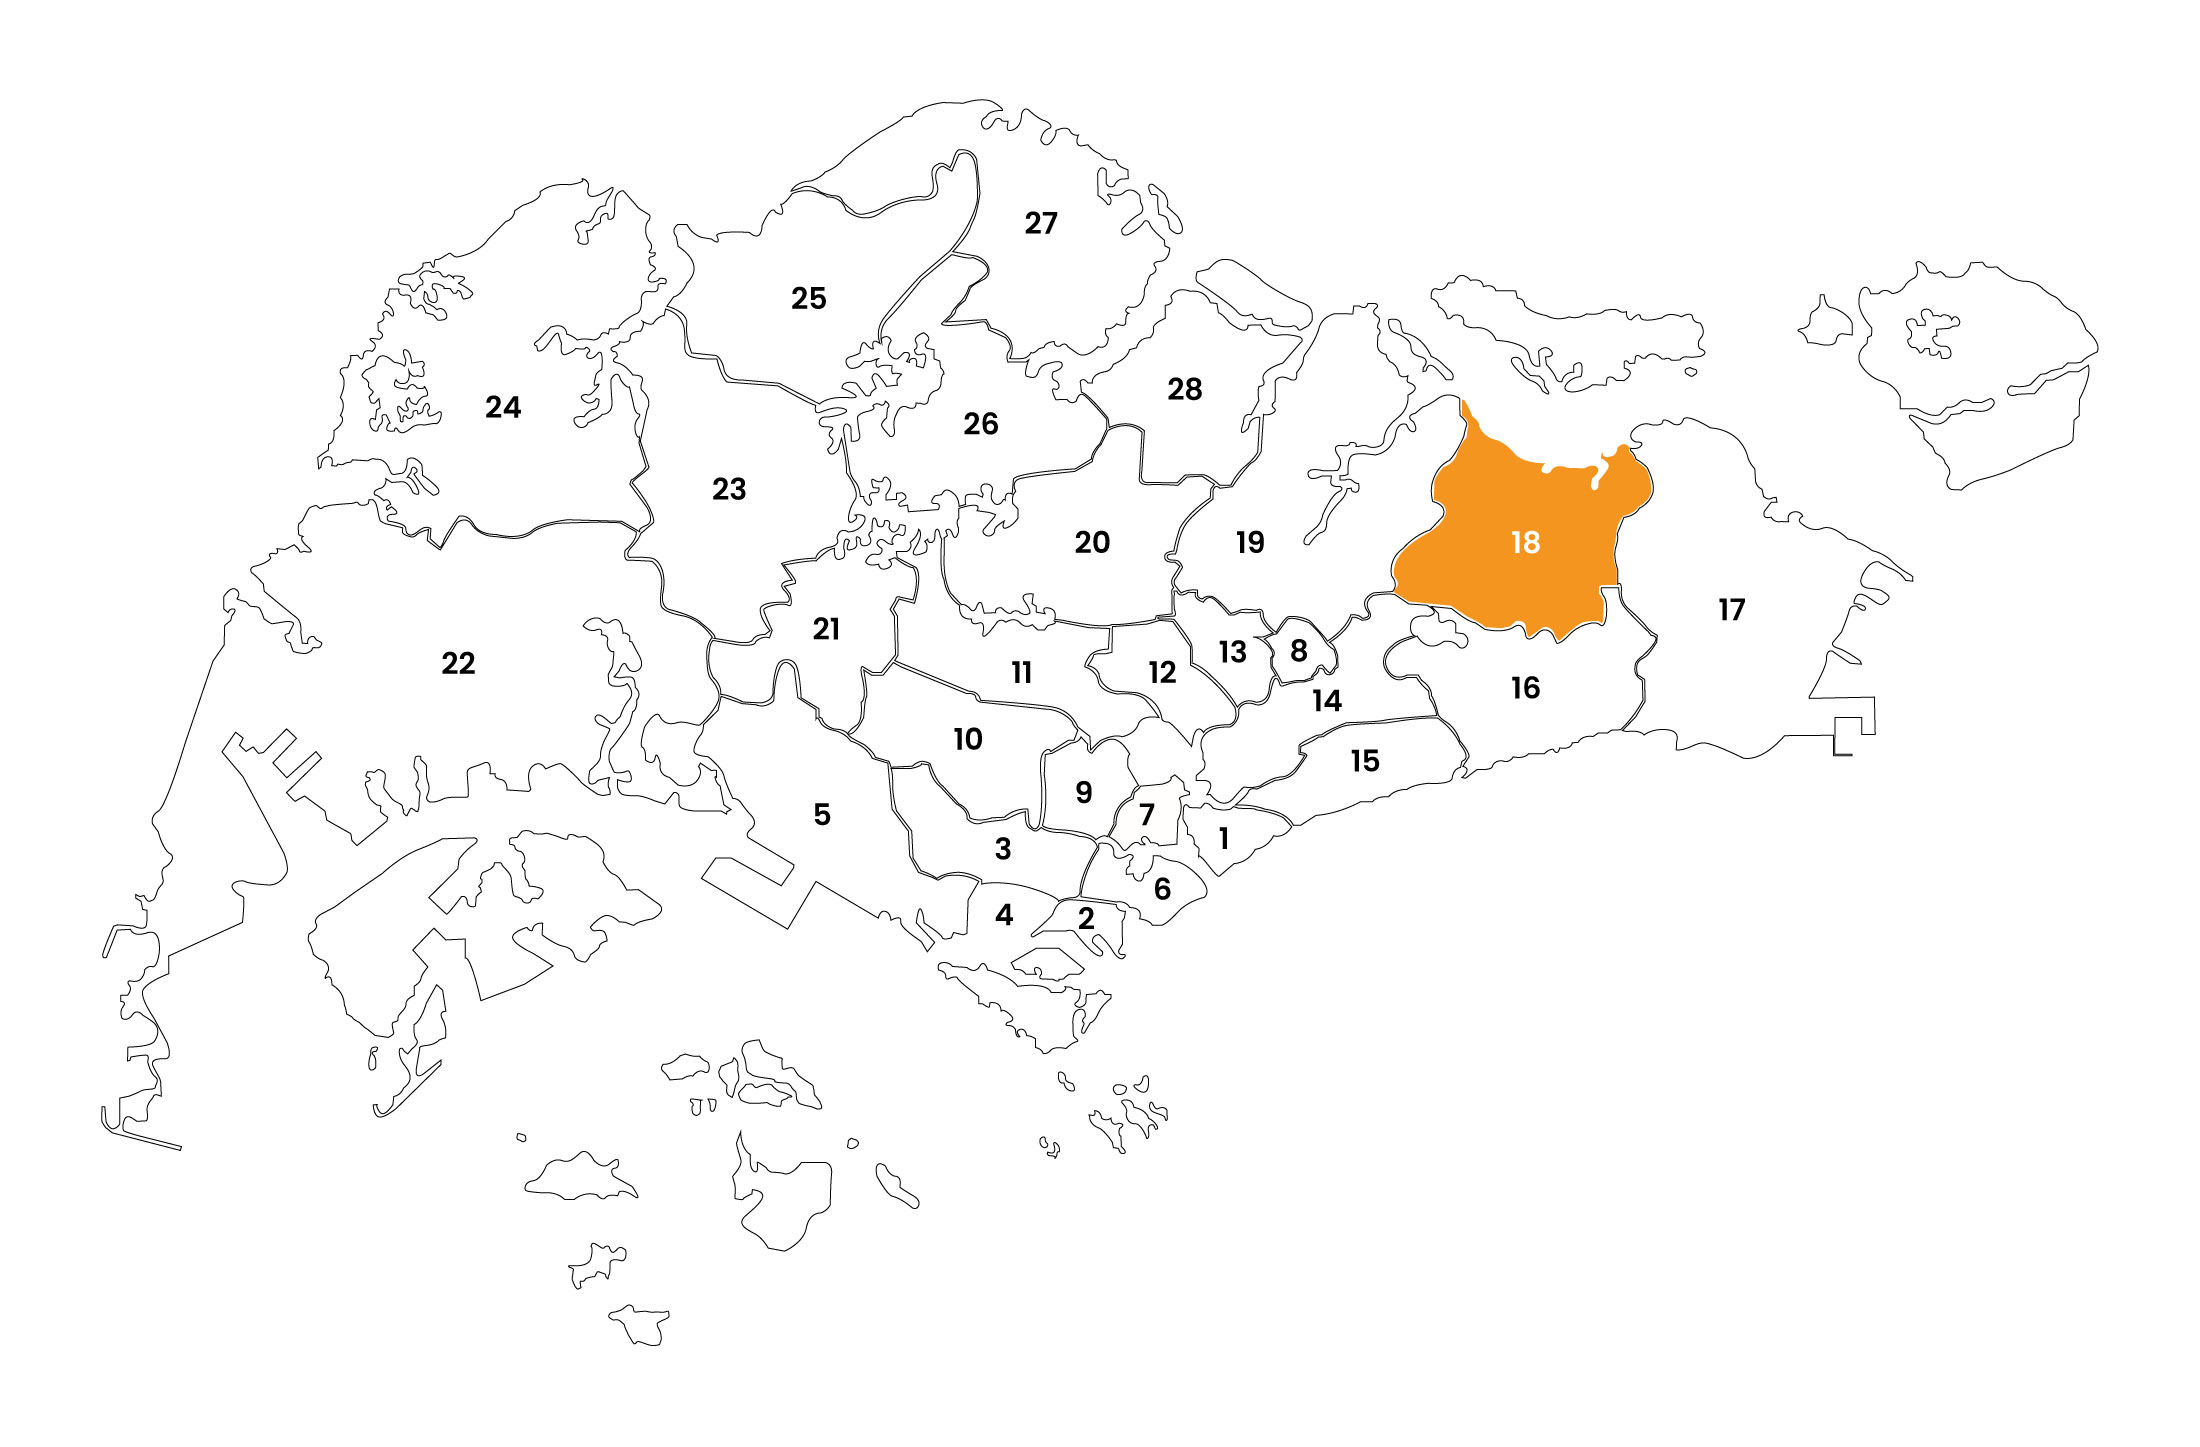 District 18